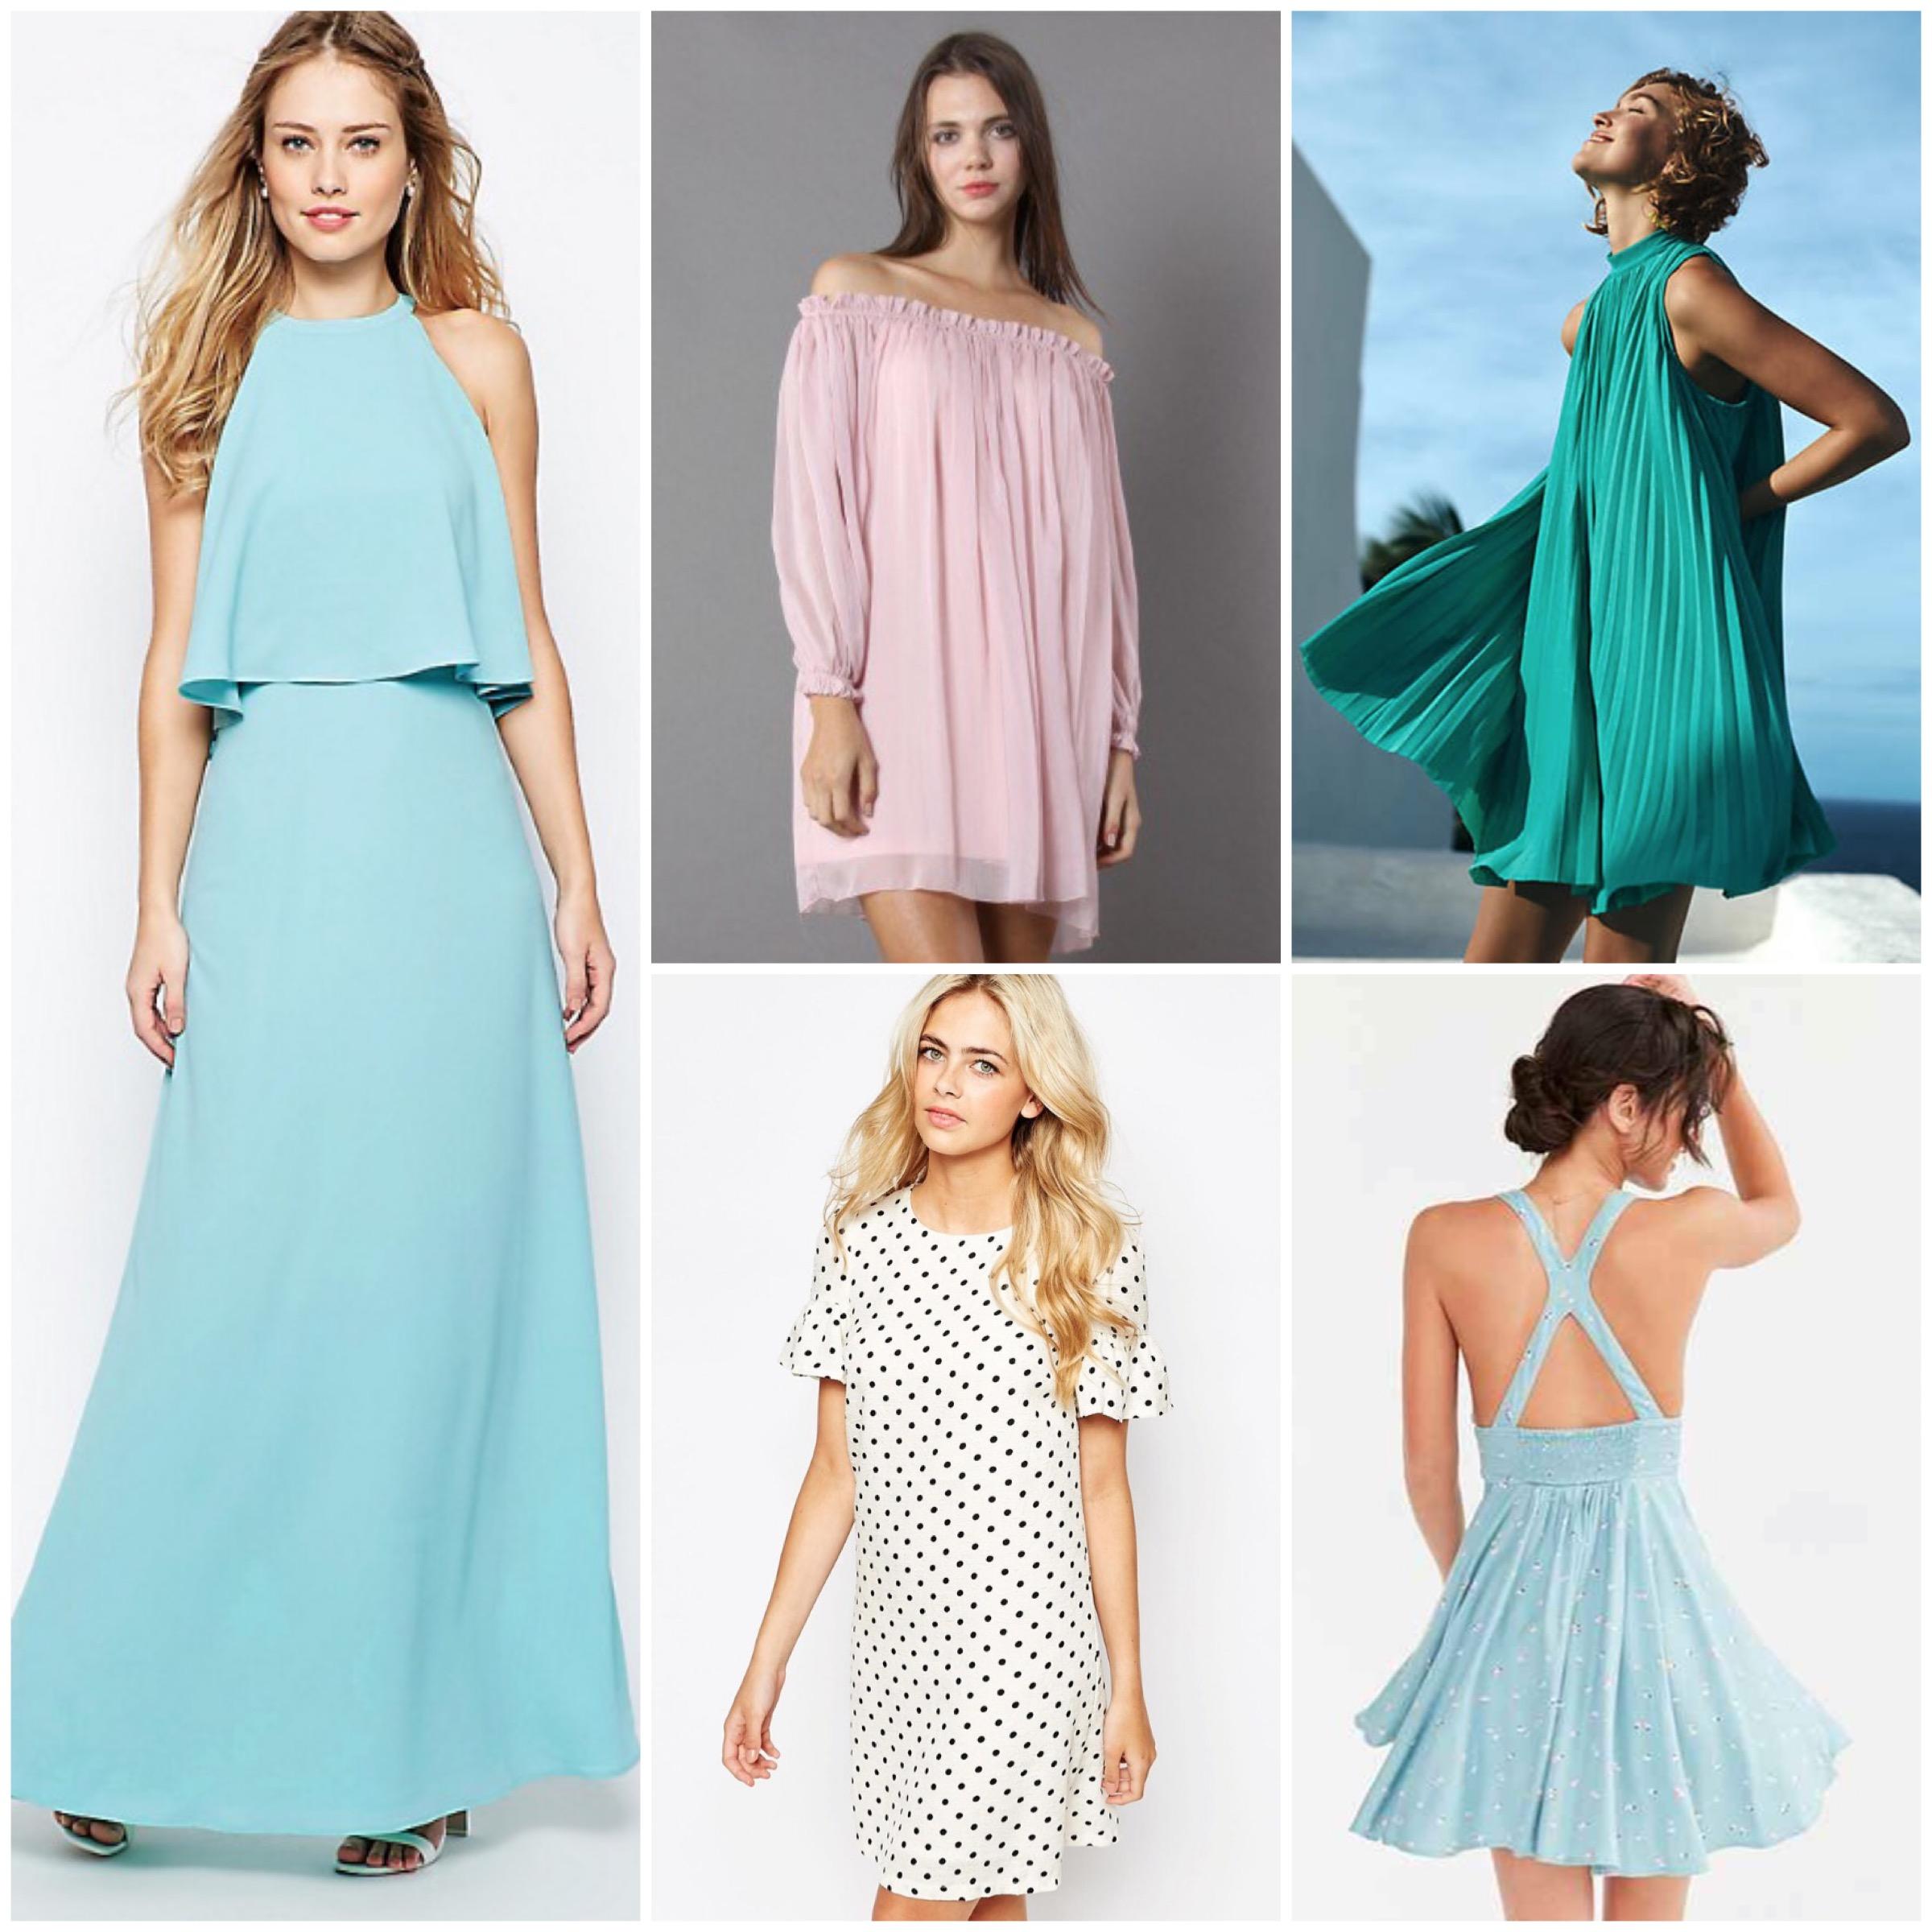 14 Cute Spring Dresses